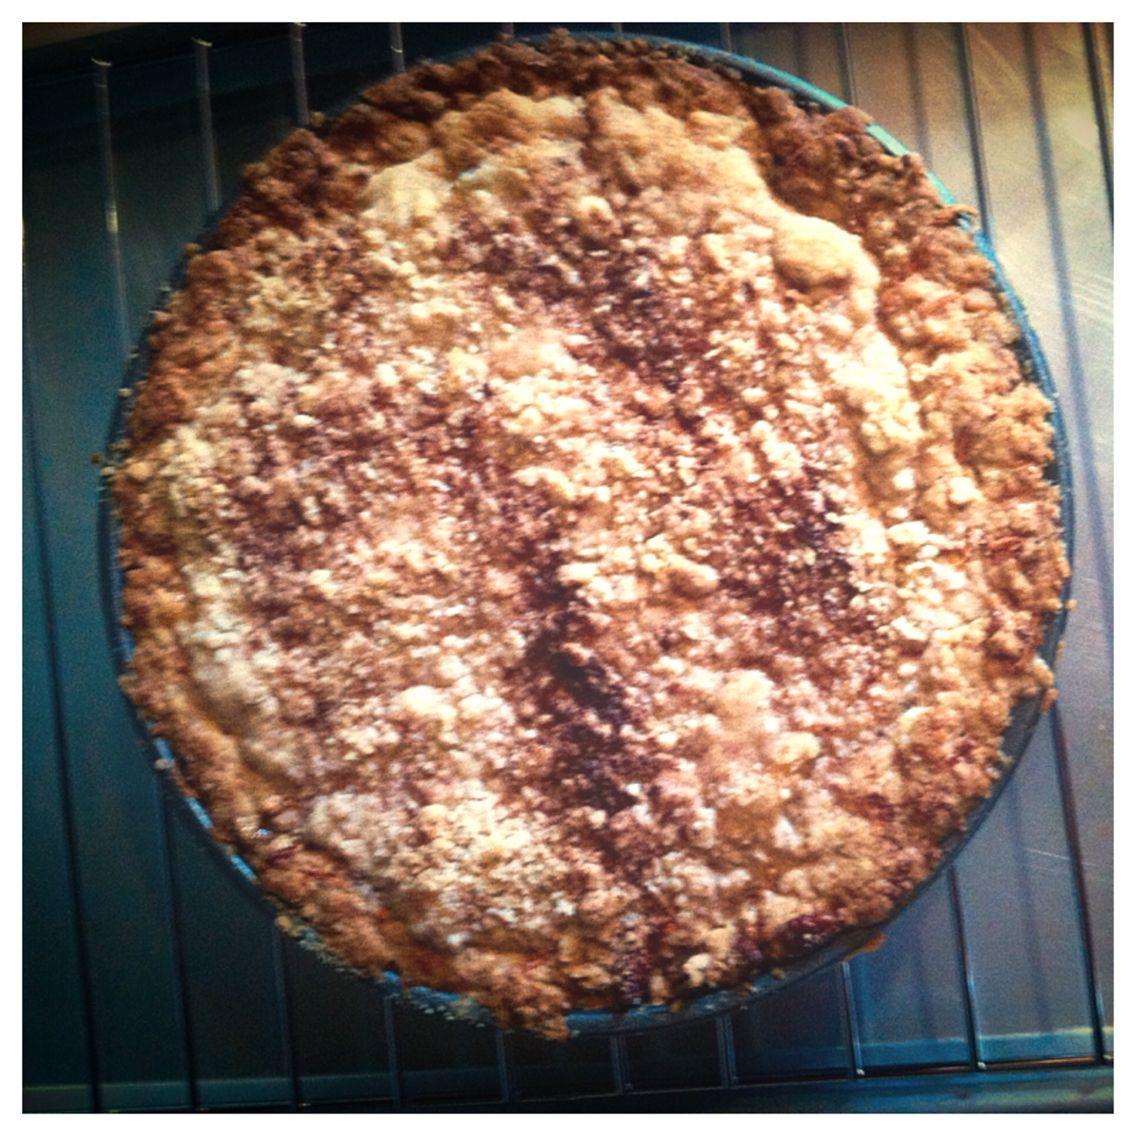 Apple cheddar tart